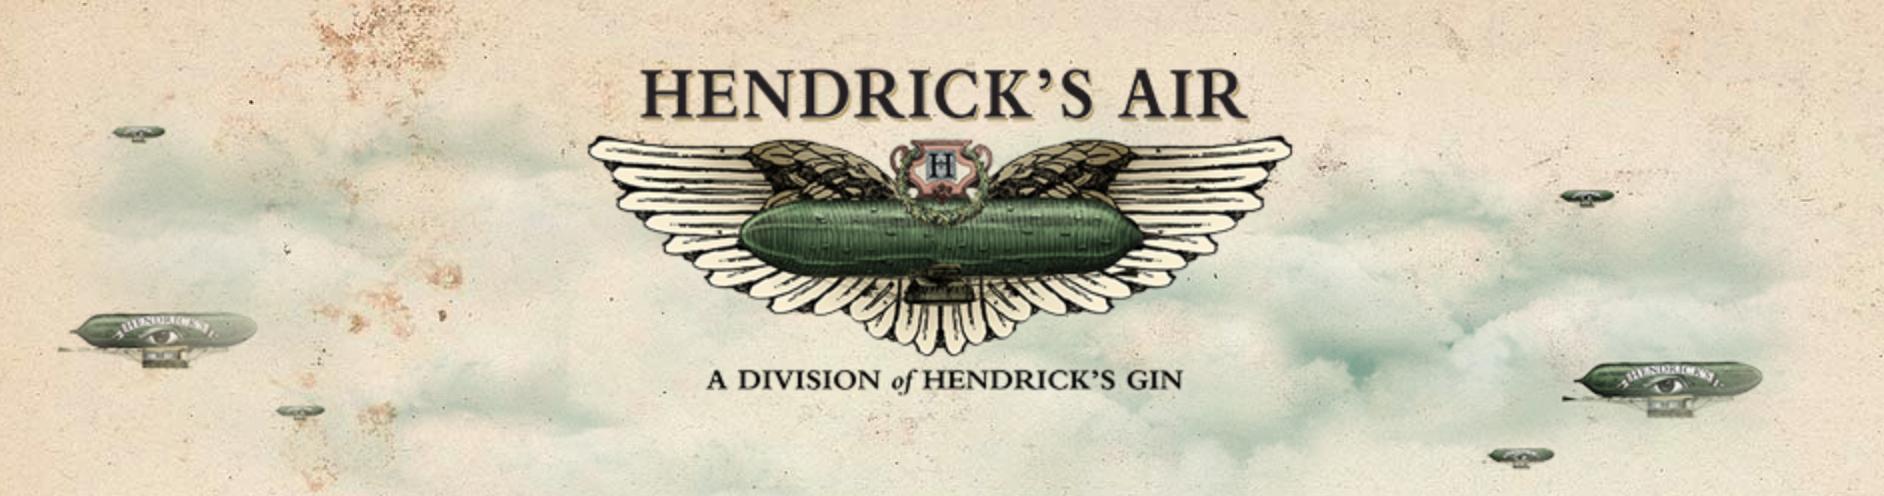 Hendricks Air.png